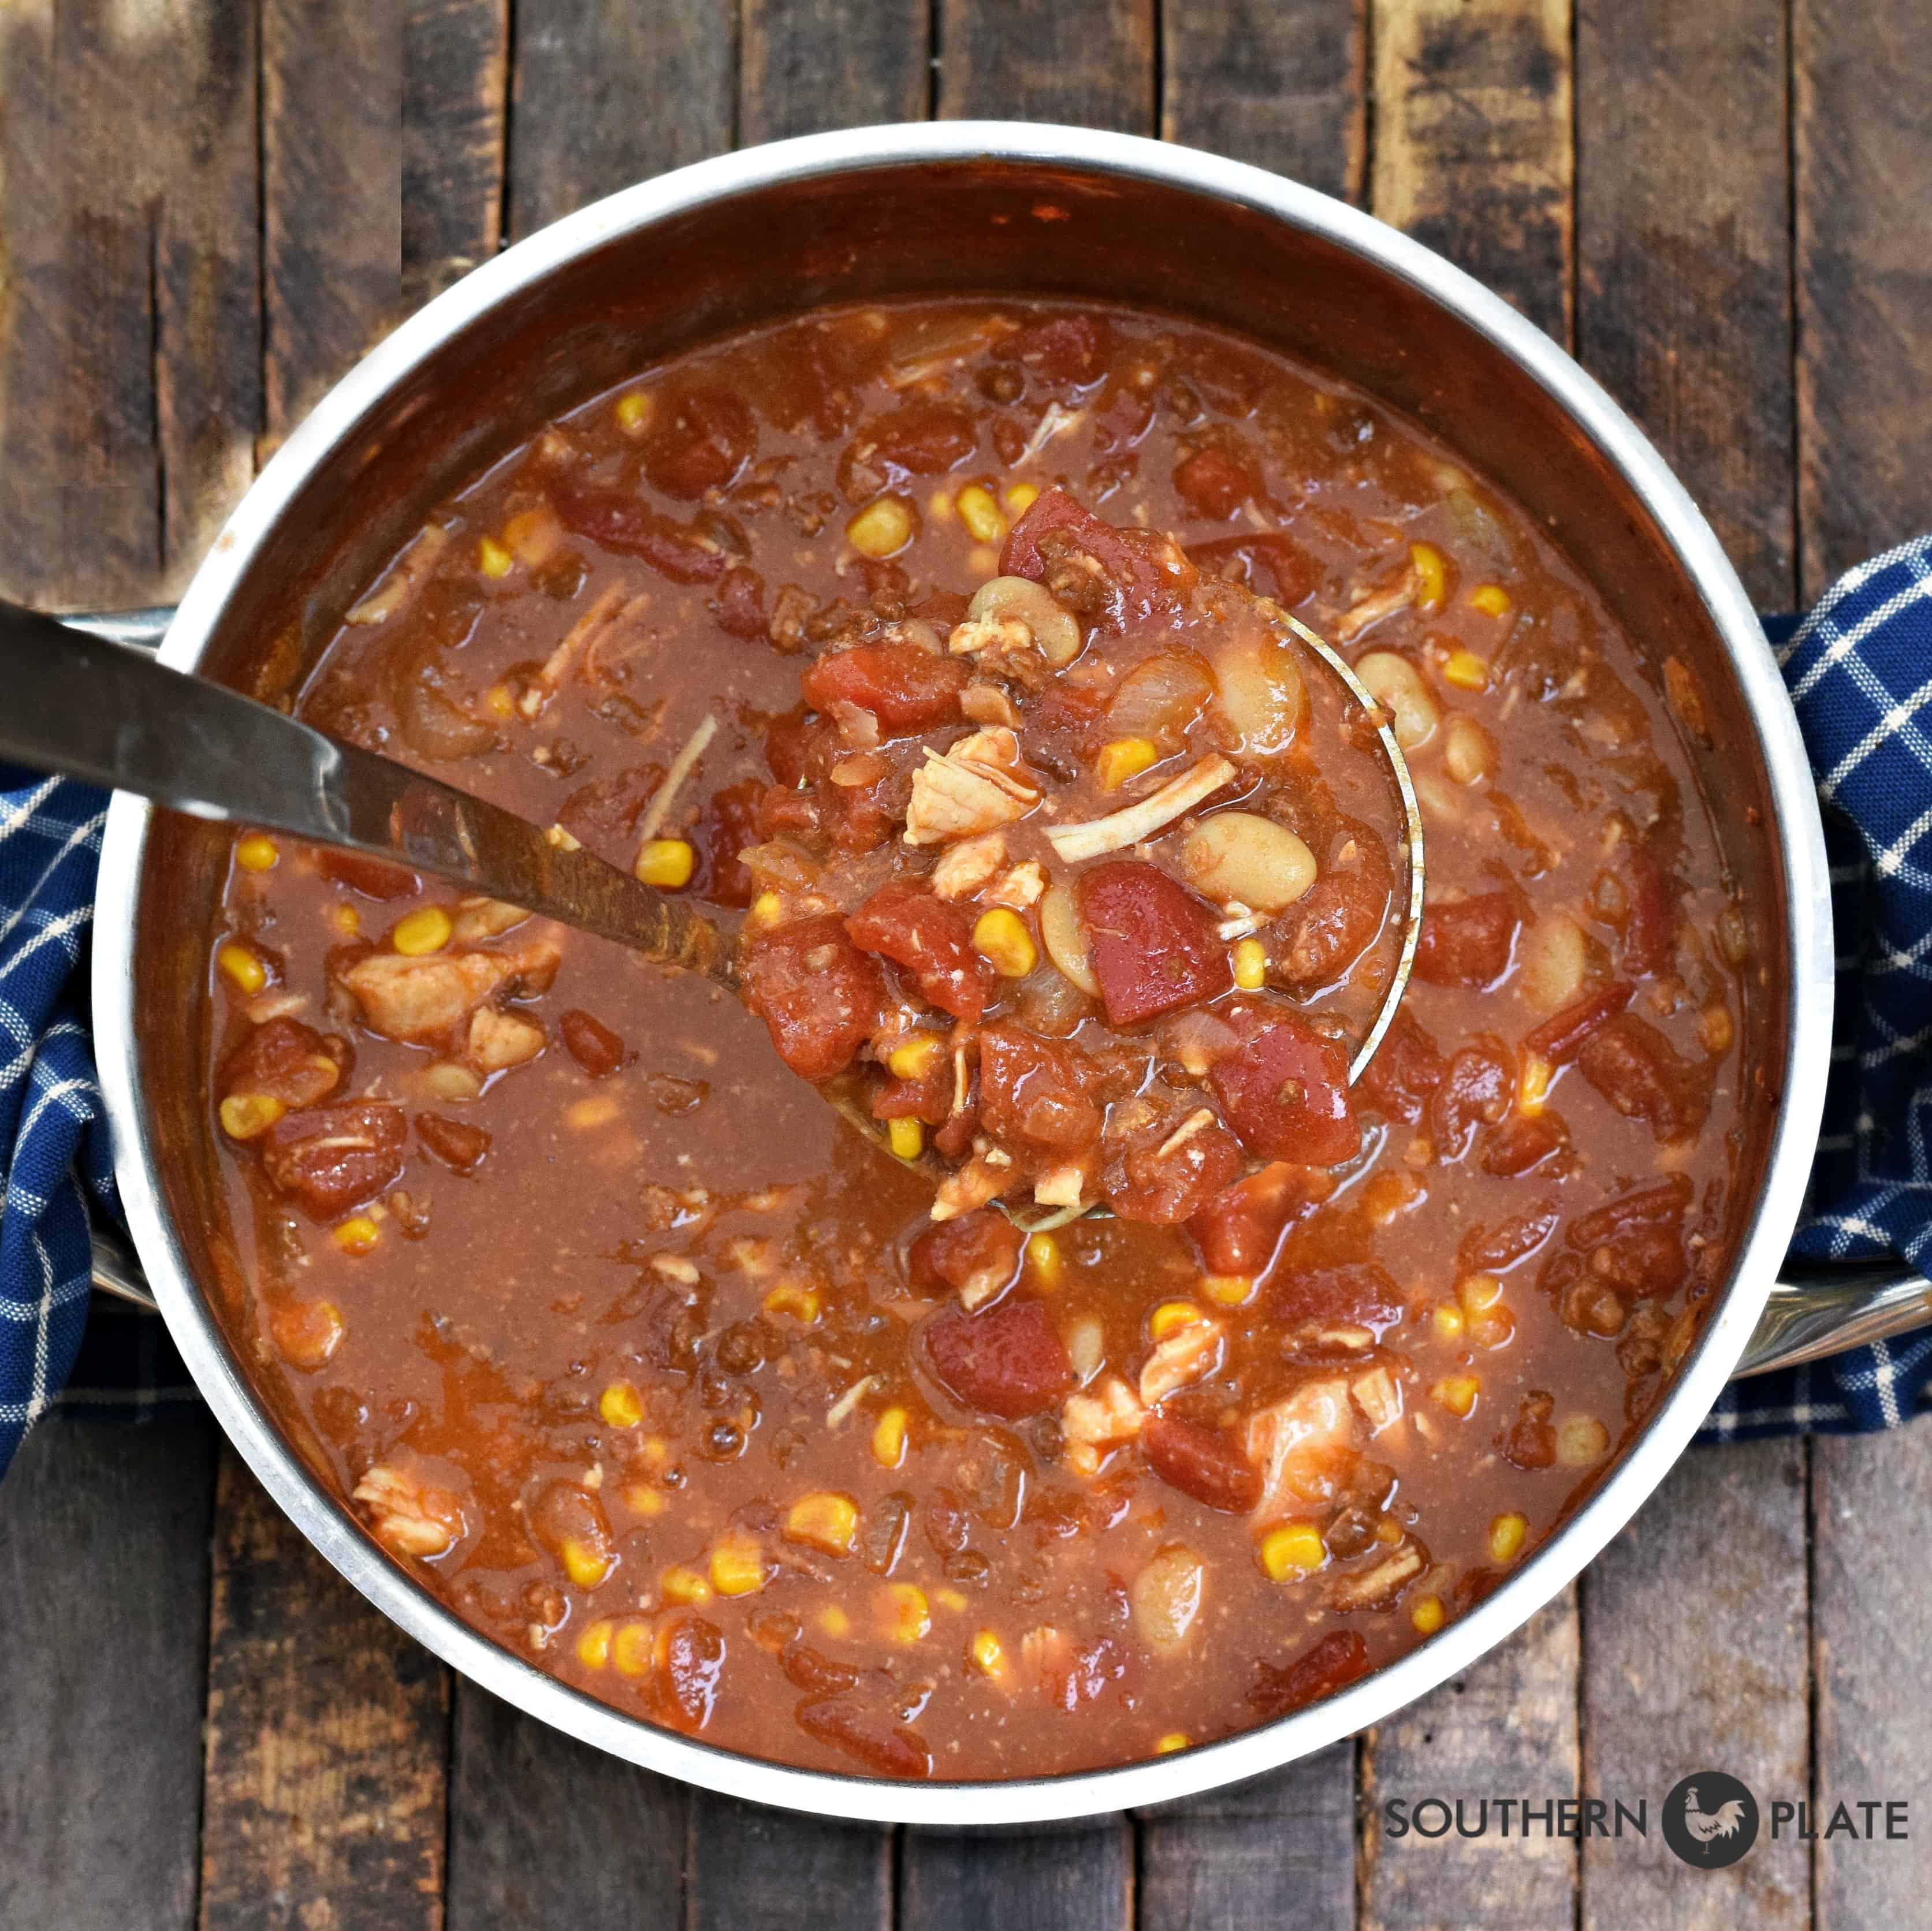 Top 10 Great Camping Recipes: Famous Alabama Camp Stew